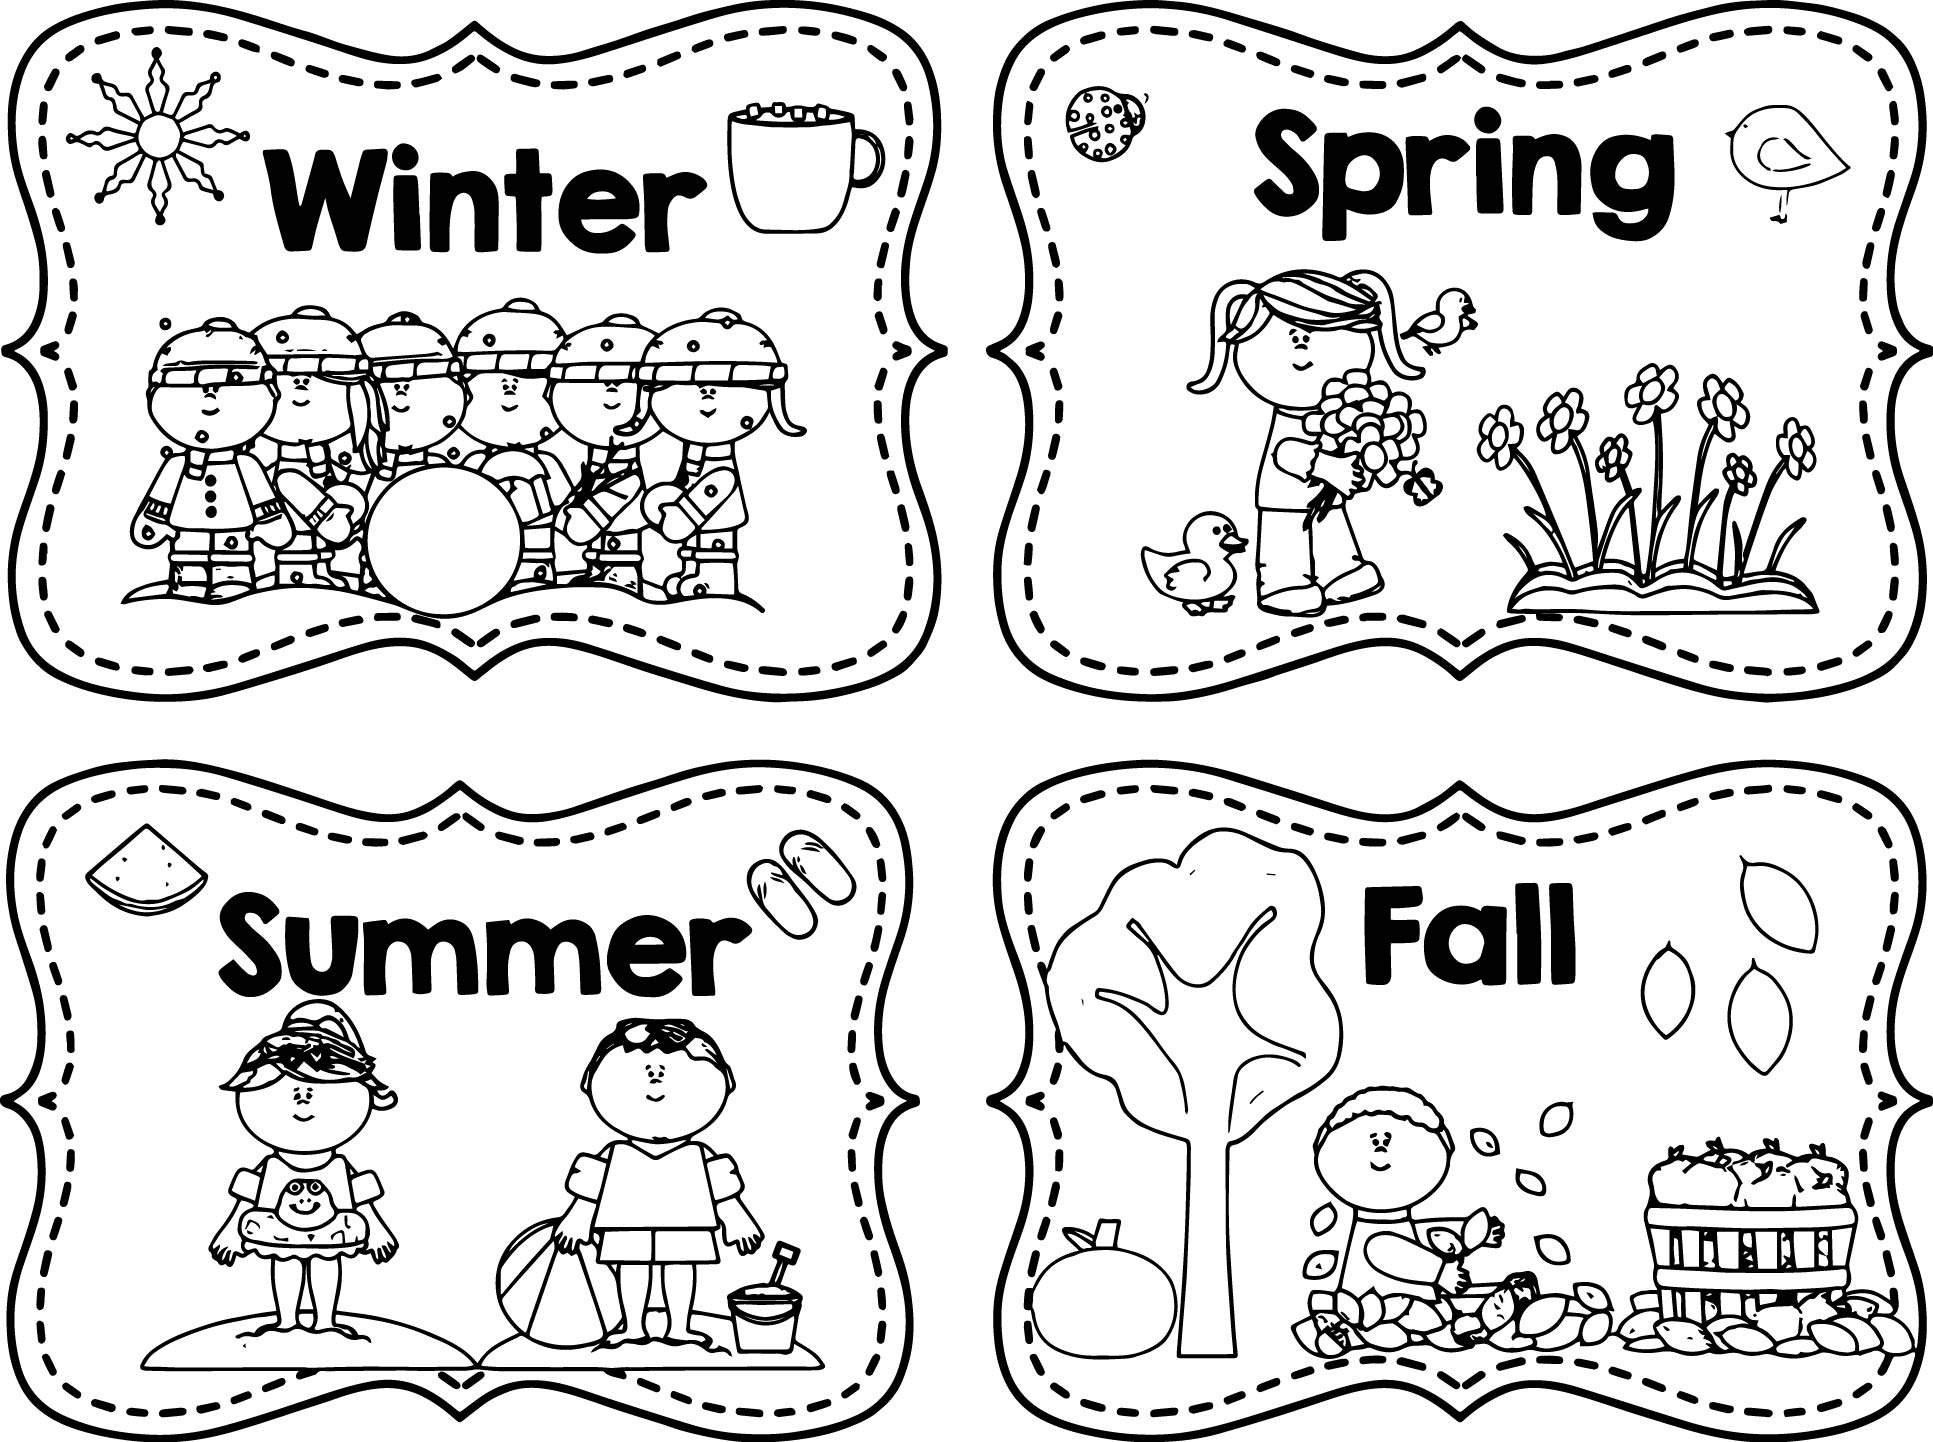 autumn season coloring pages fall coloring pages fall harvest bounty coloring page autumn pages coloring season